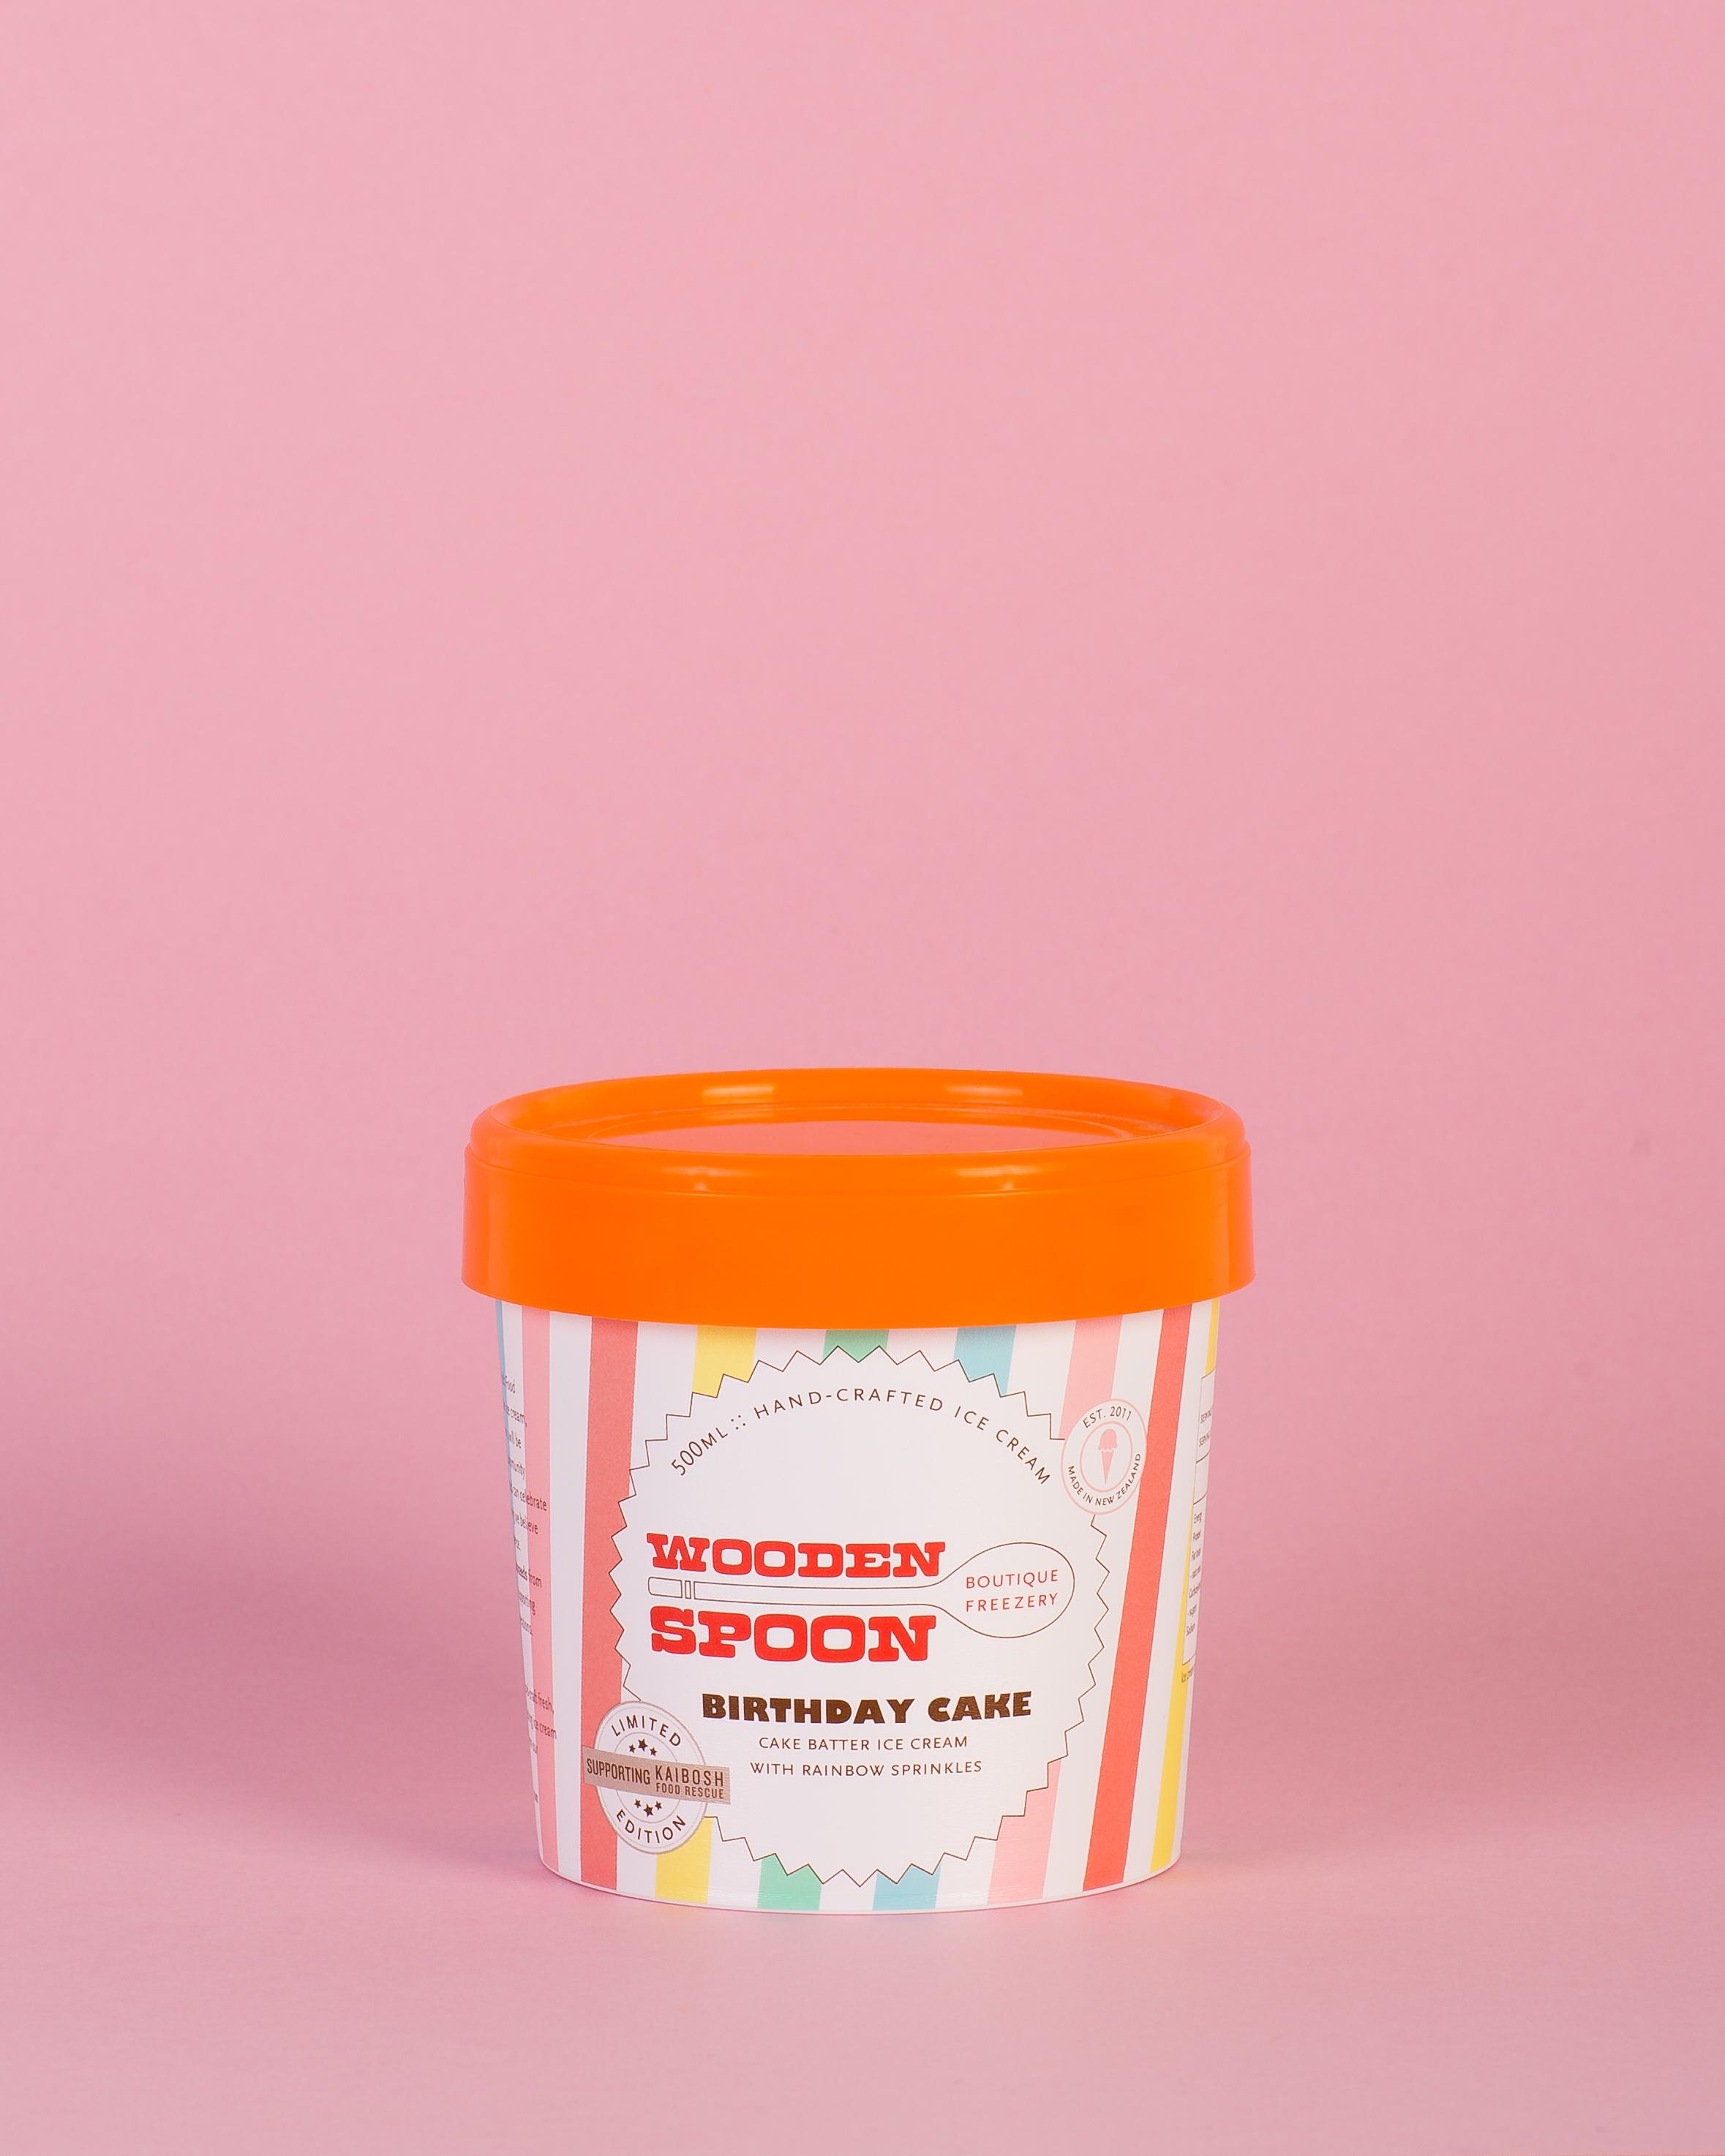 BIRTHDAY CAKE : Cake batter ice cream with rainbow sprinkles (egg free)